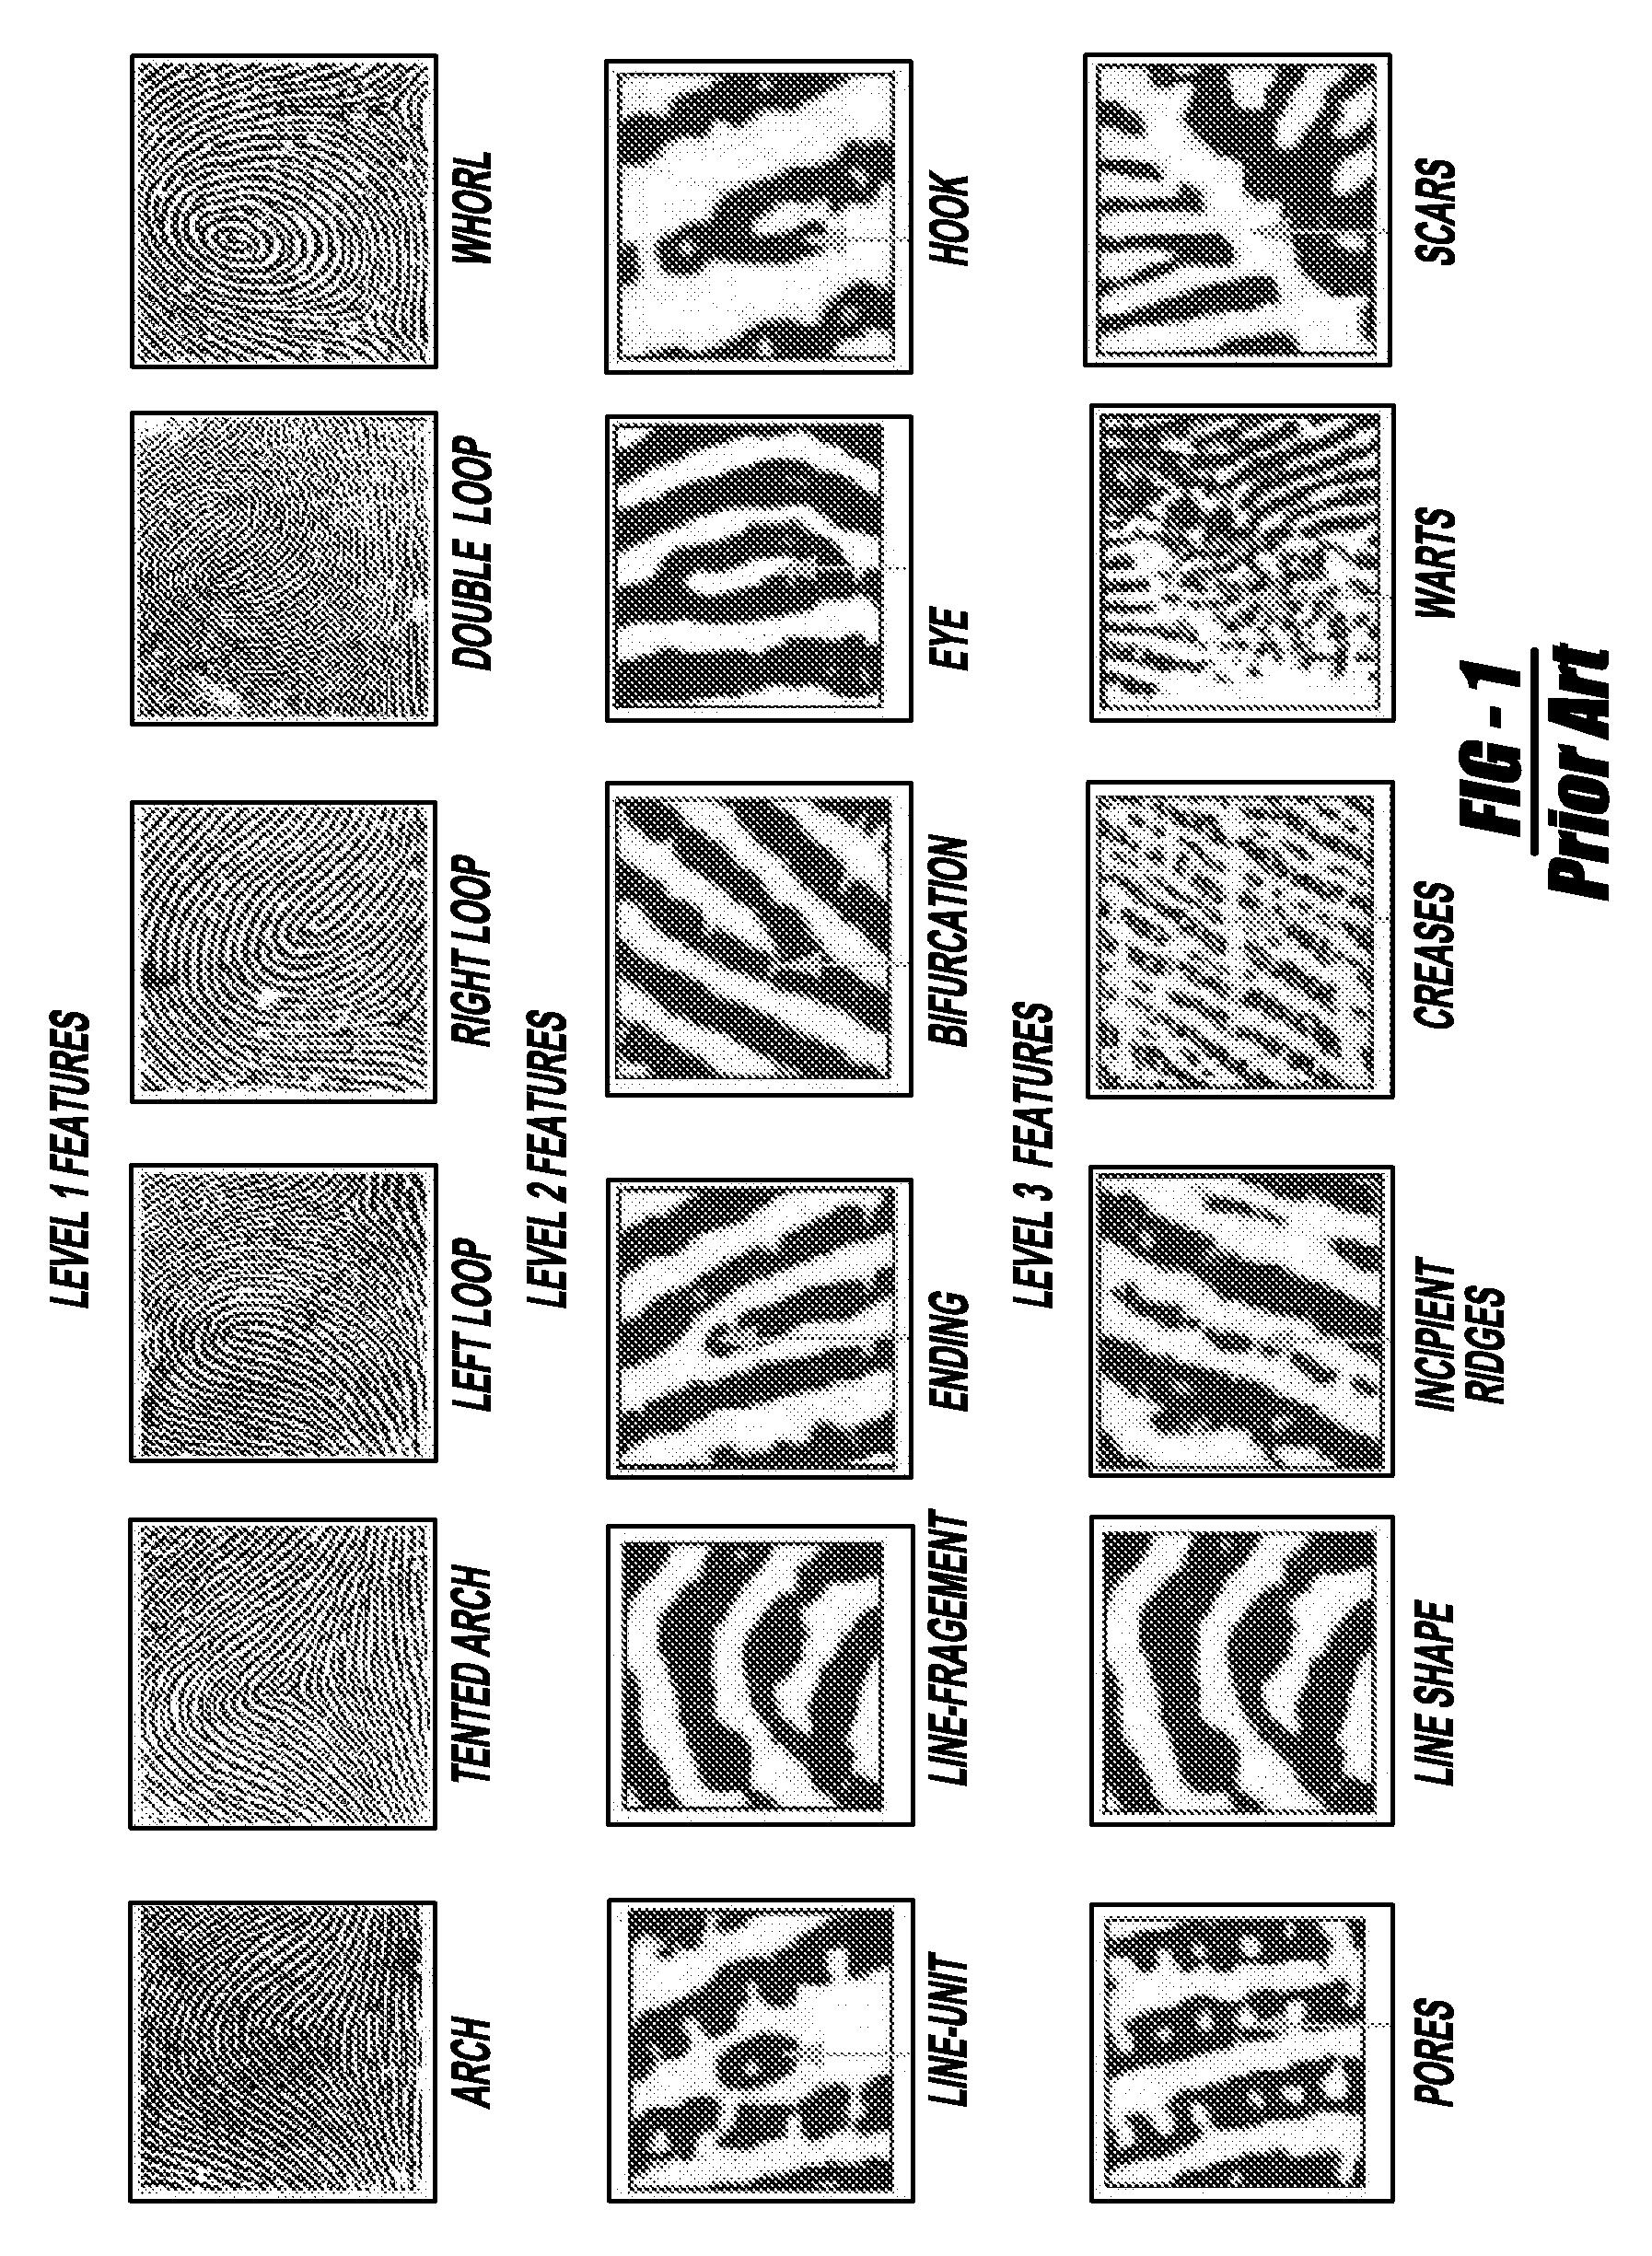 Fingerprint Characteristics Worksheet